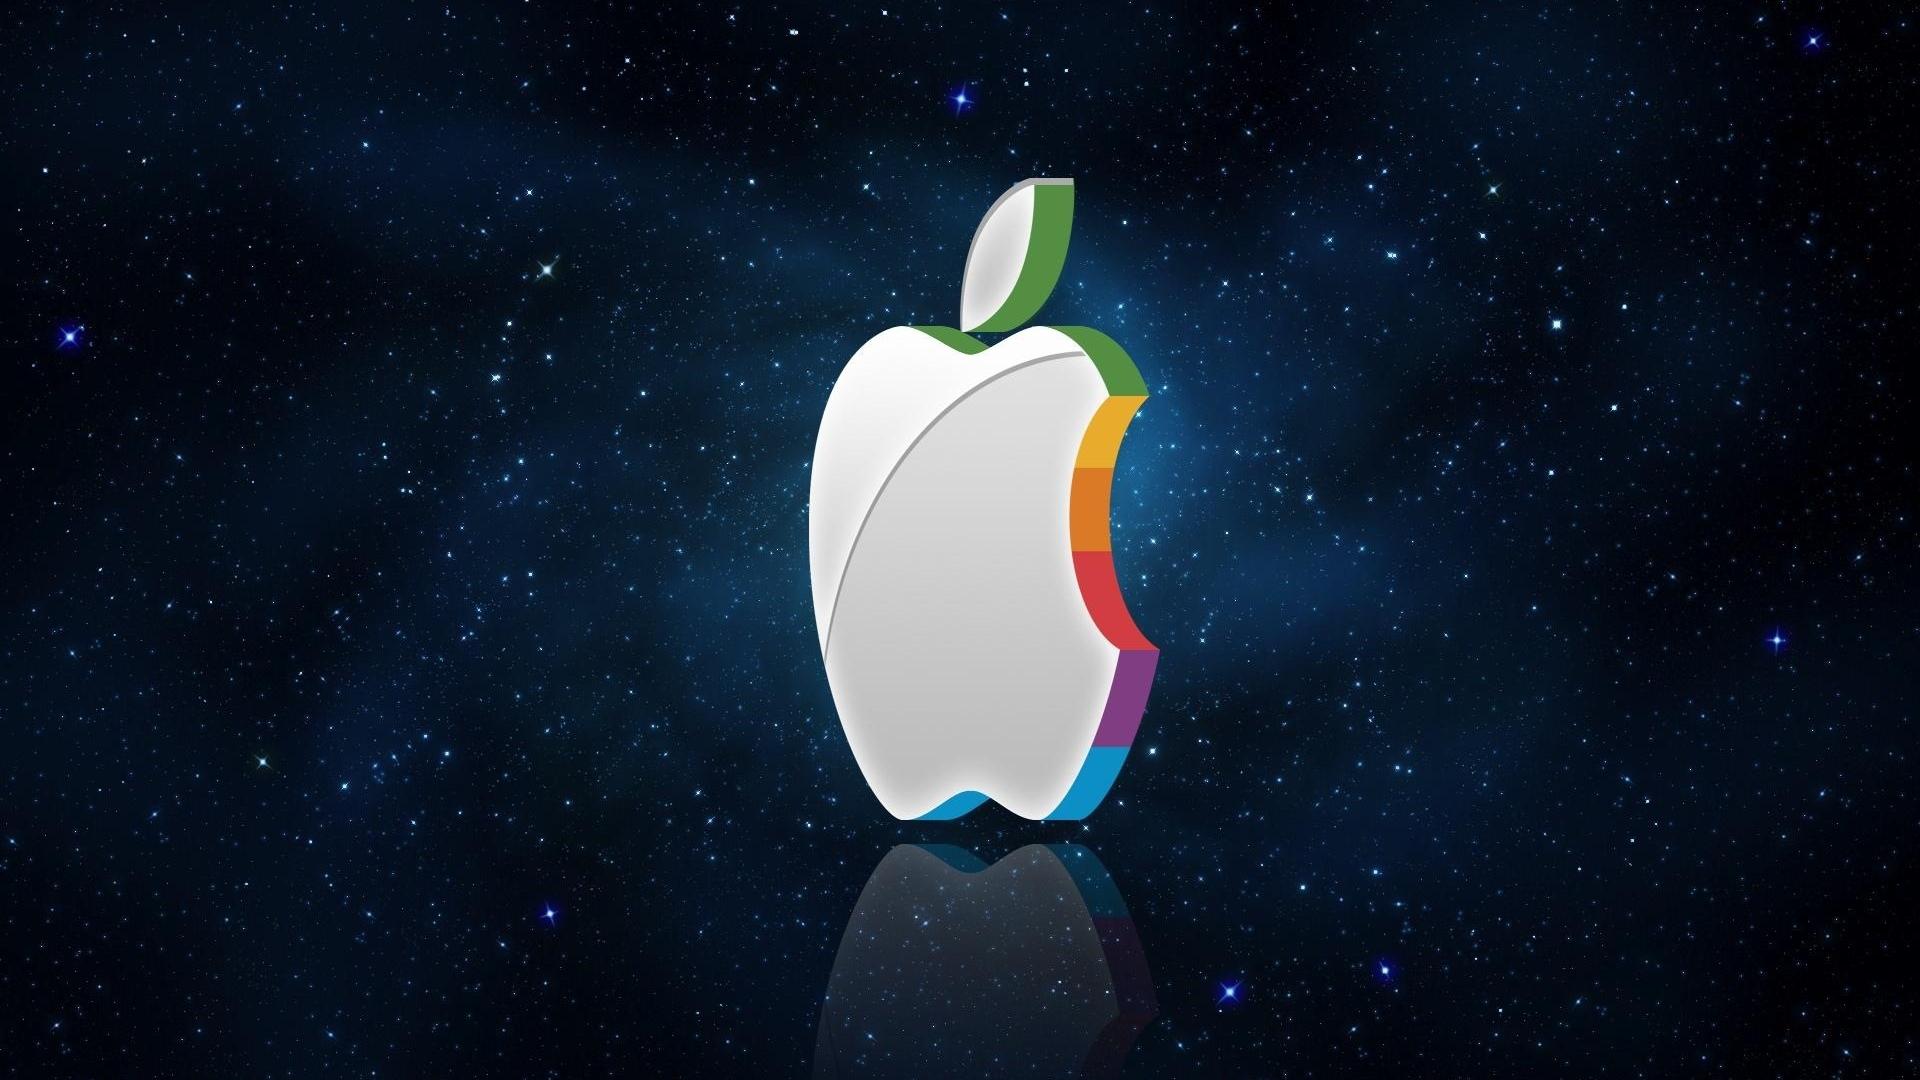 Apple Desktop Wallpaper HD wallpaper background 1920x1080